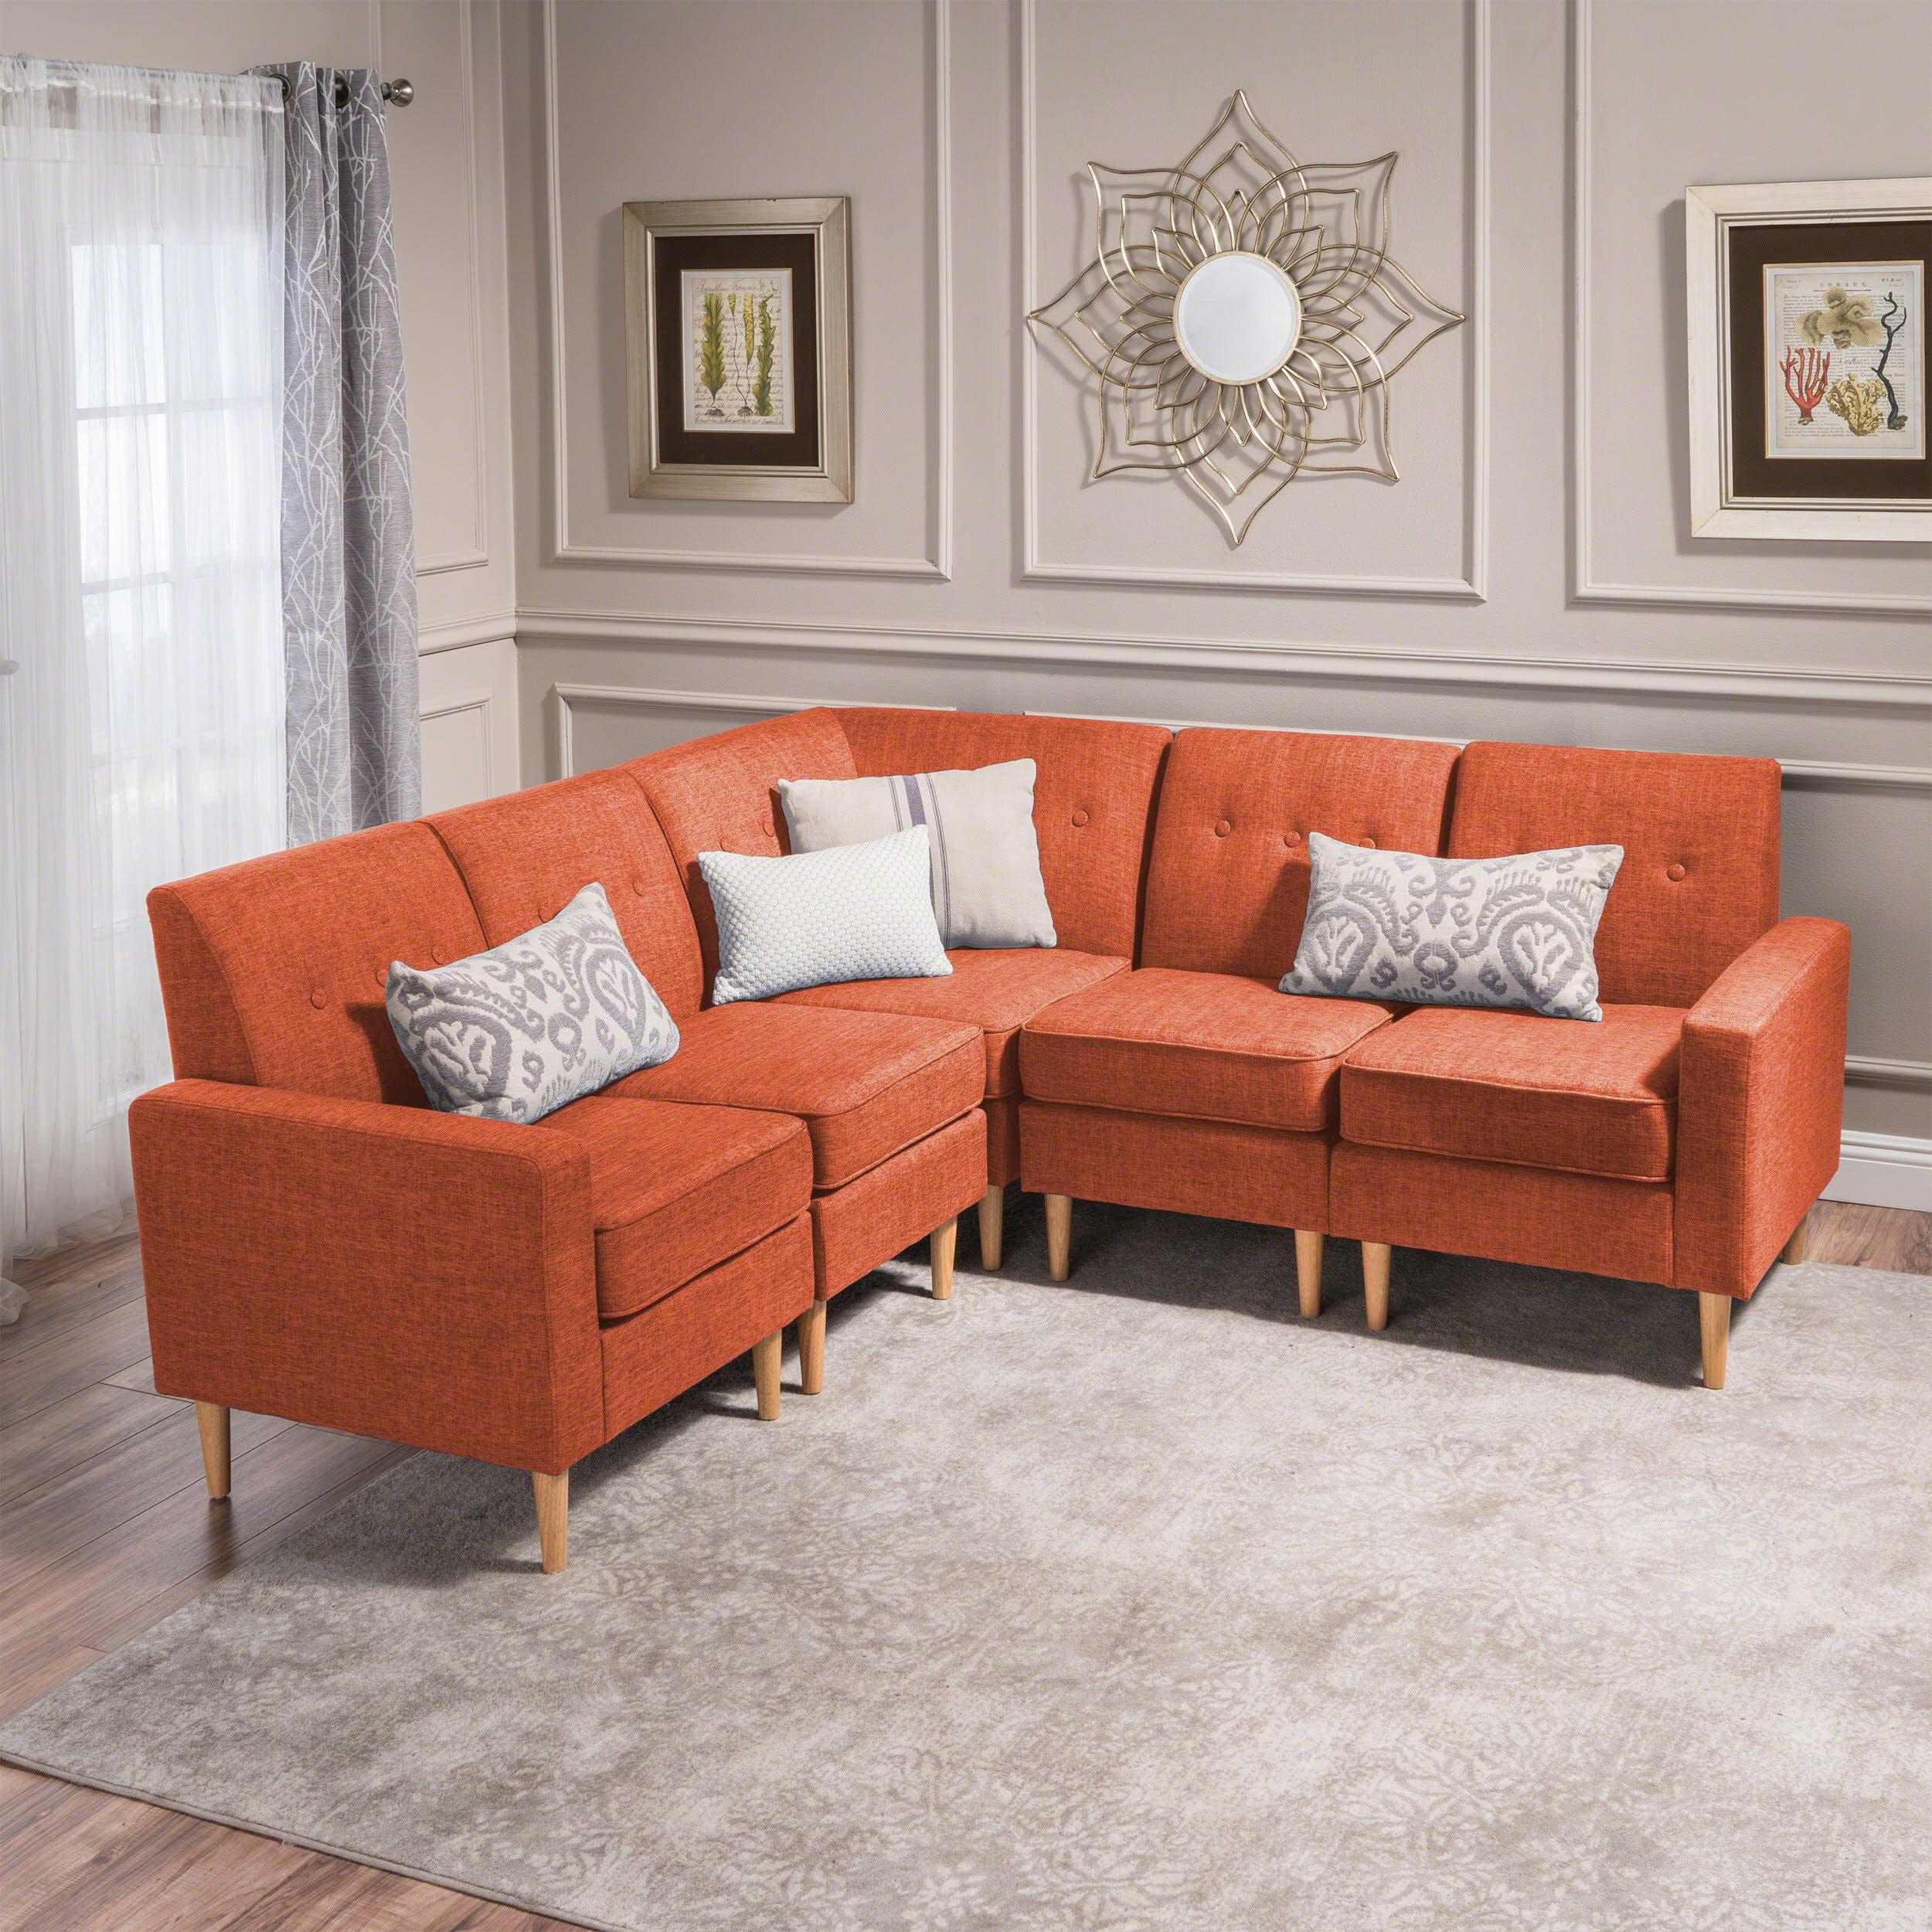 Terrific Great Deal Furniture Samuel Mid Century Modern 5 Piece Muted Orange Fabric Sectional Sofa Set Unemploymentrelief Wooden Chair Designs For Living Room Unemploymentrelieforg